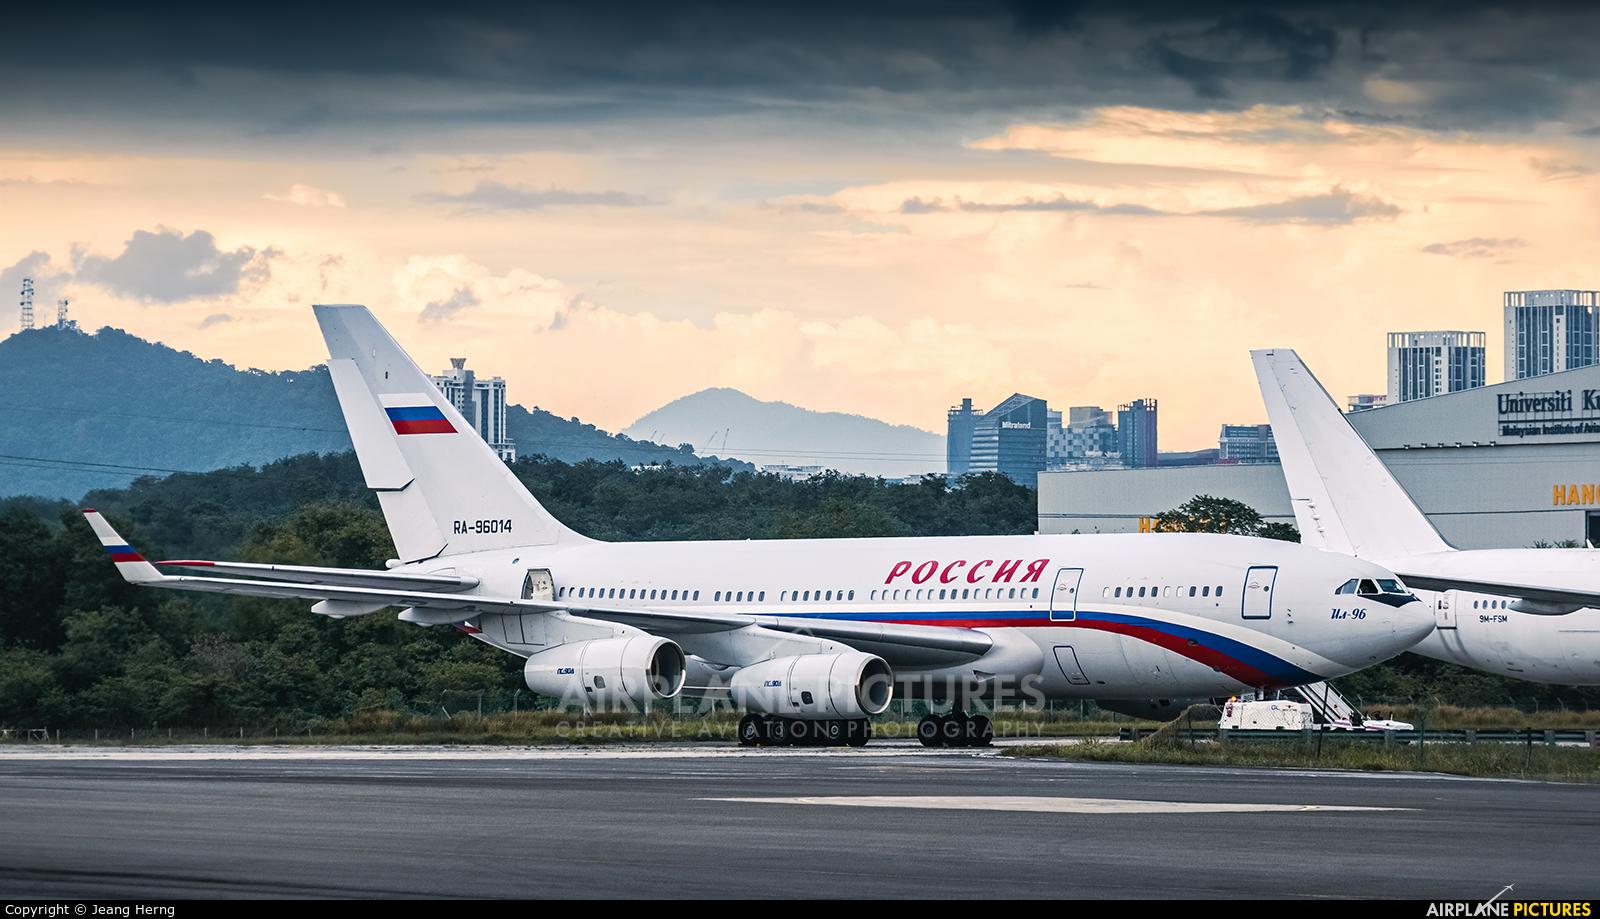 Rossiya Special Flight Detachment RA-96014 aircraft at Subang - Sultan Abdul Aziz Shah